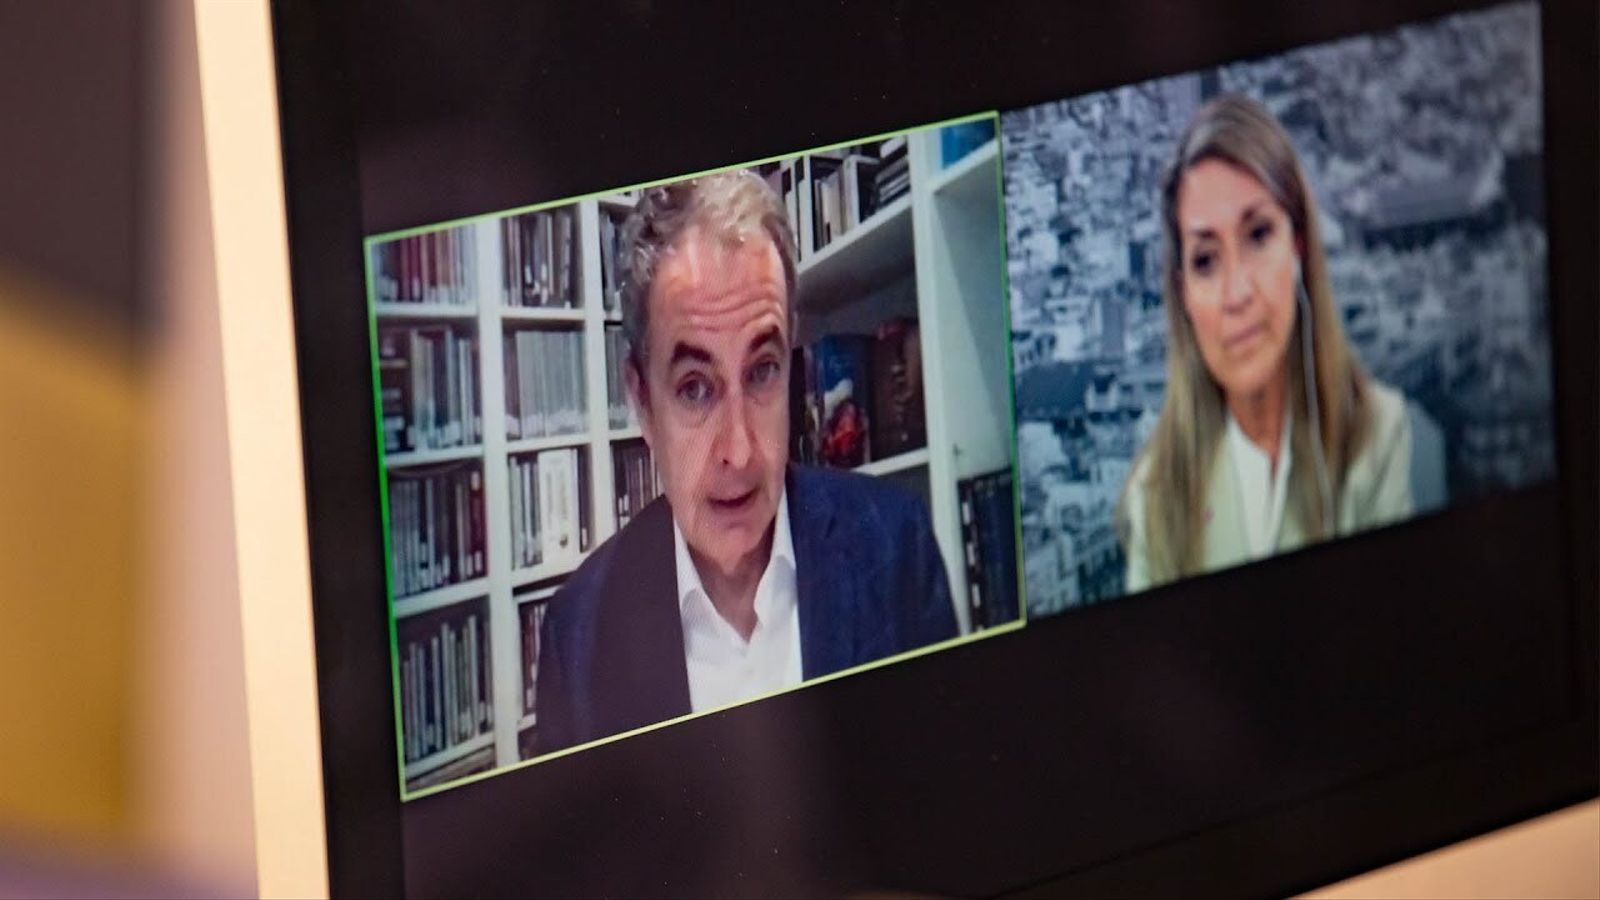 Entrevista d'Esther Vera a José Luis Rodríguez Zapatero